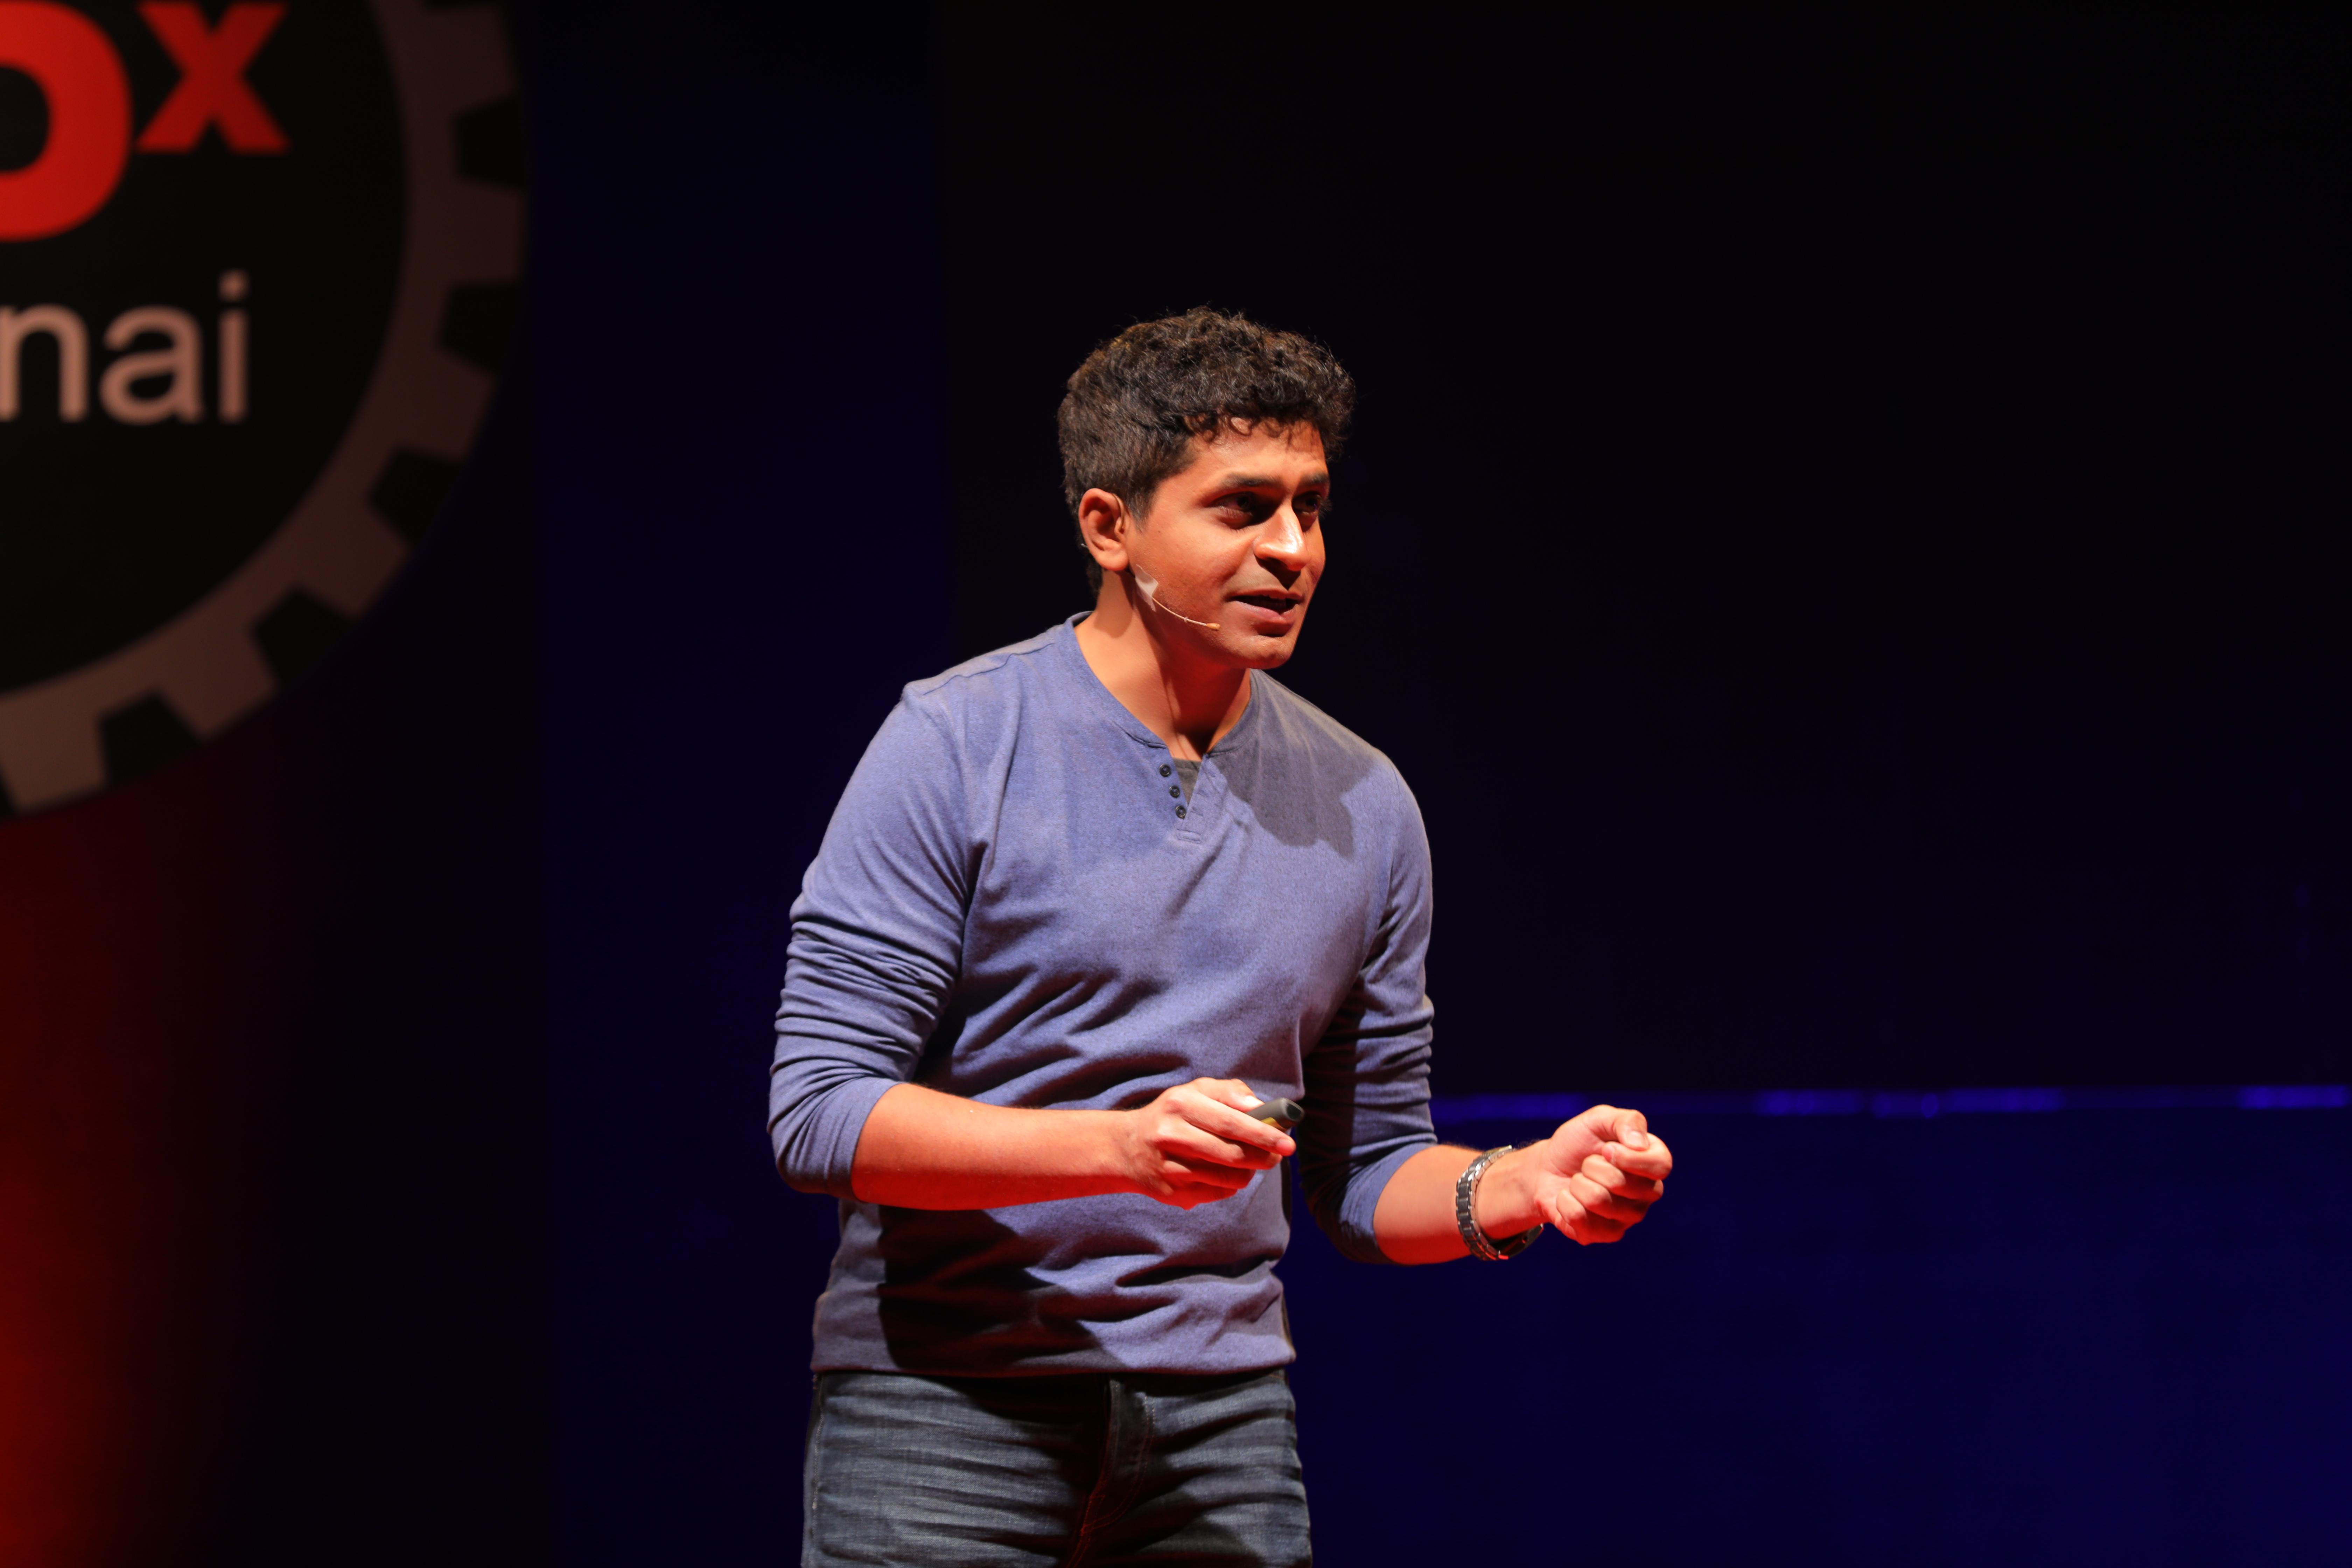 Sairam Emani speaking about the importance of classical arts at the prestigious Tedx platform. Photo courtesy: IndianRaga